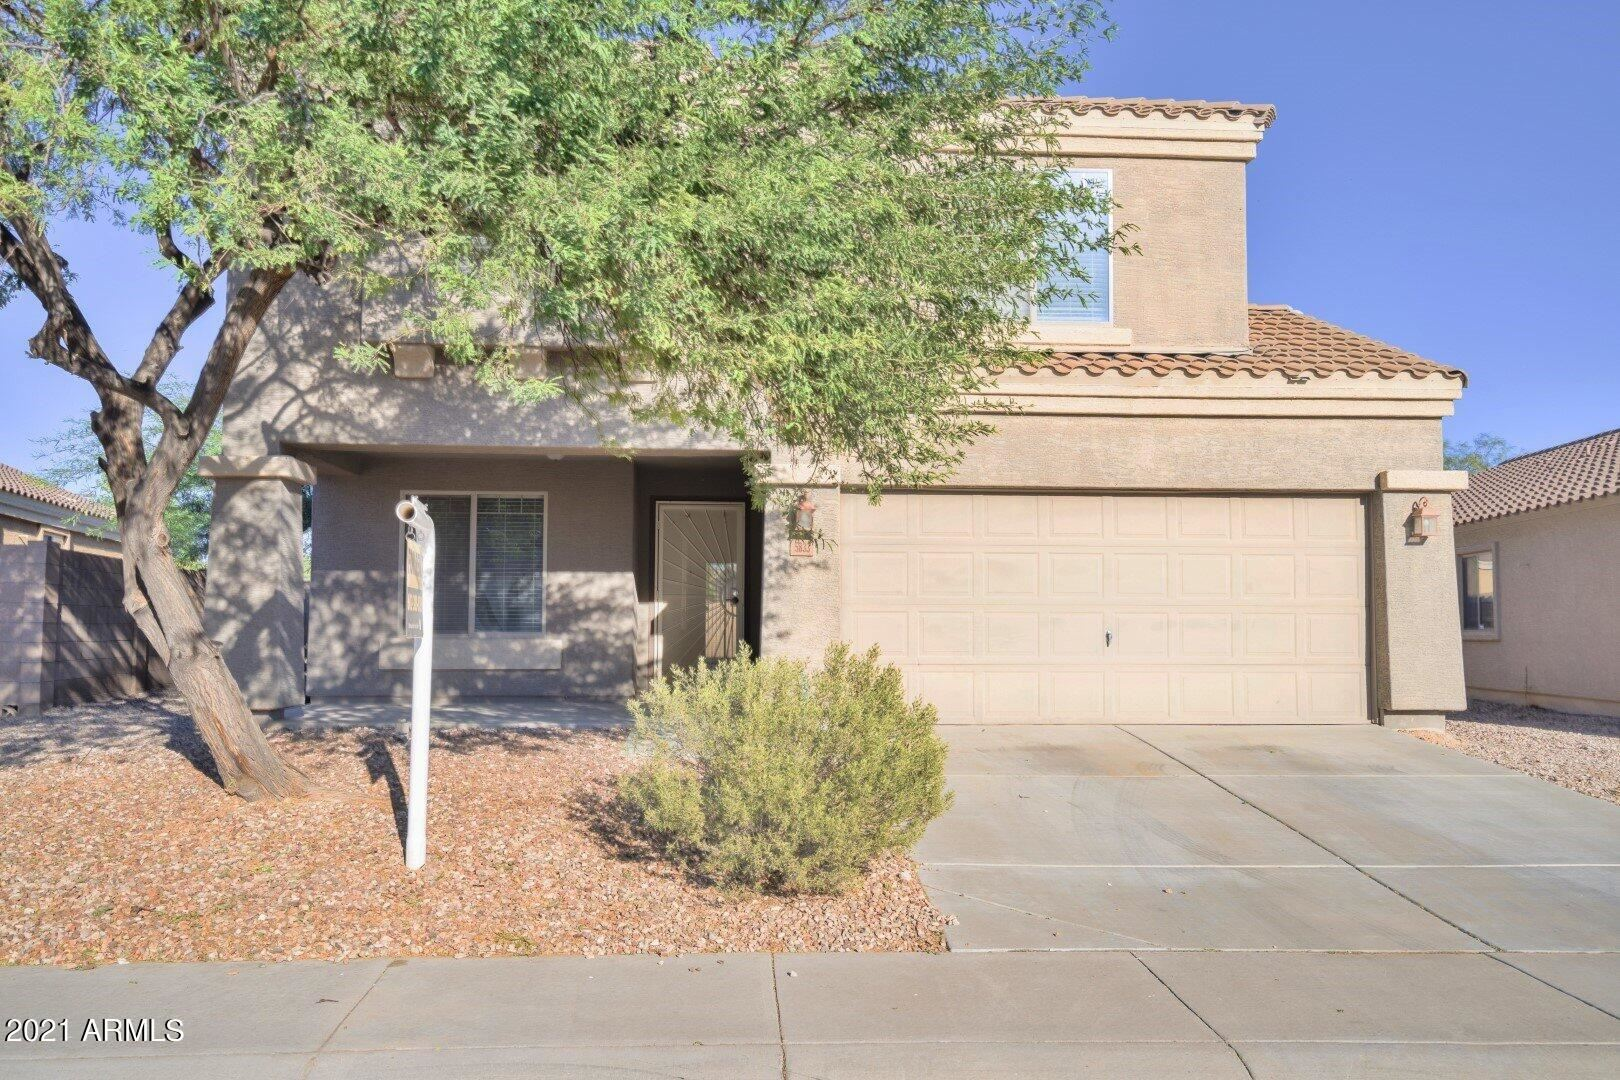 Photo of 5833 S 236TH Lane, Buckeye, AZ 85326 (MLS # 6307826)